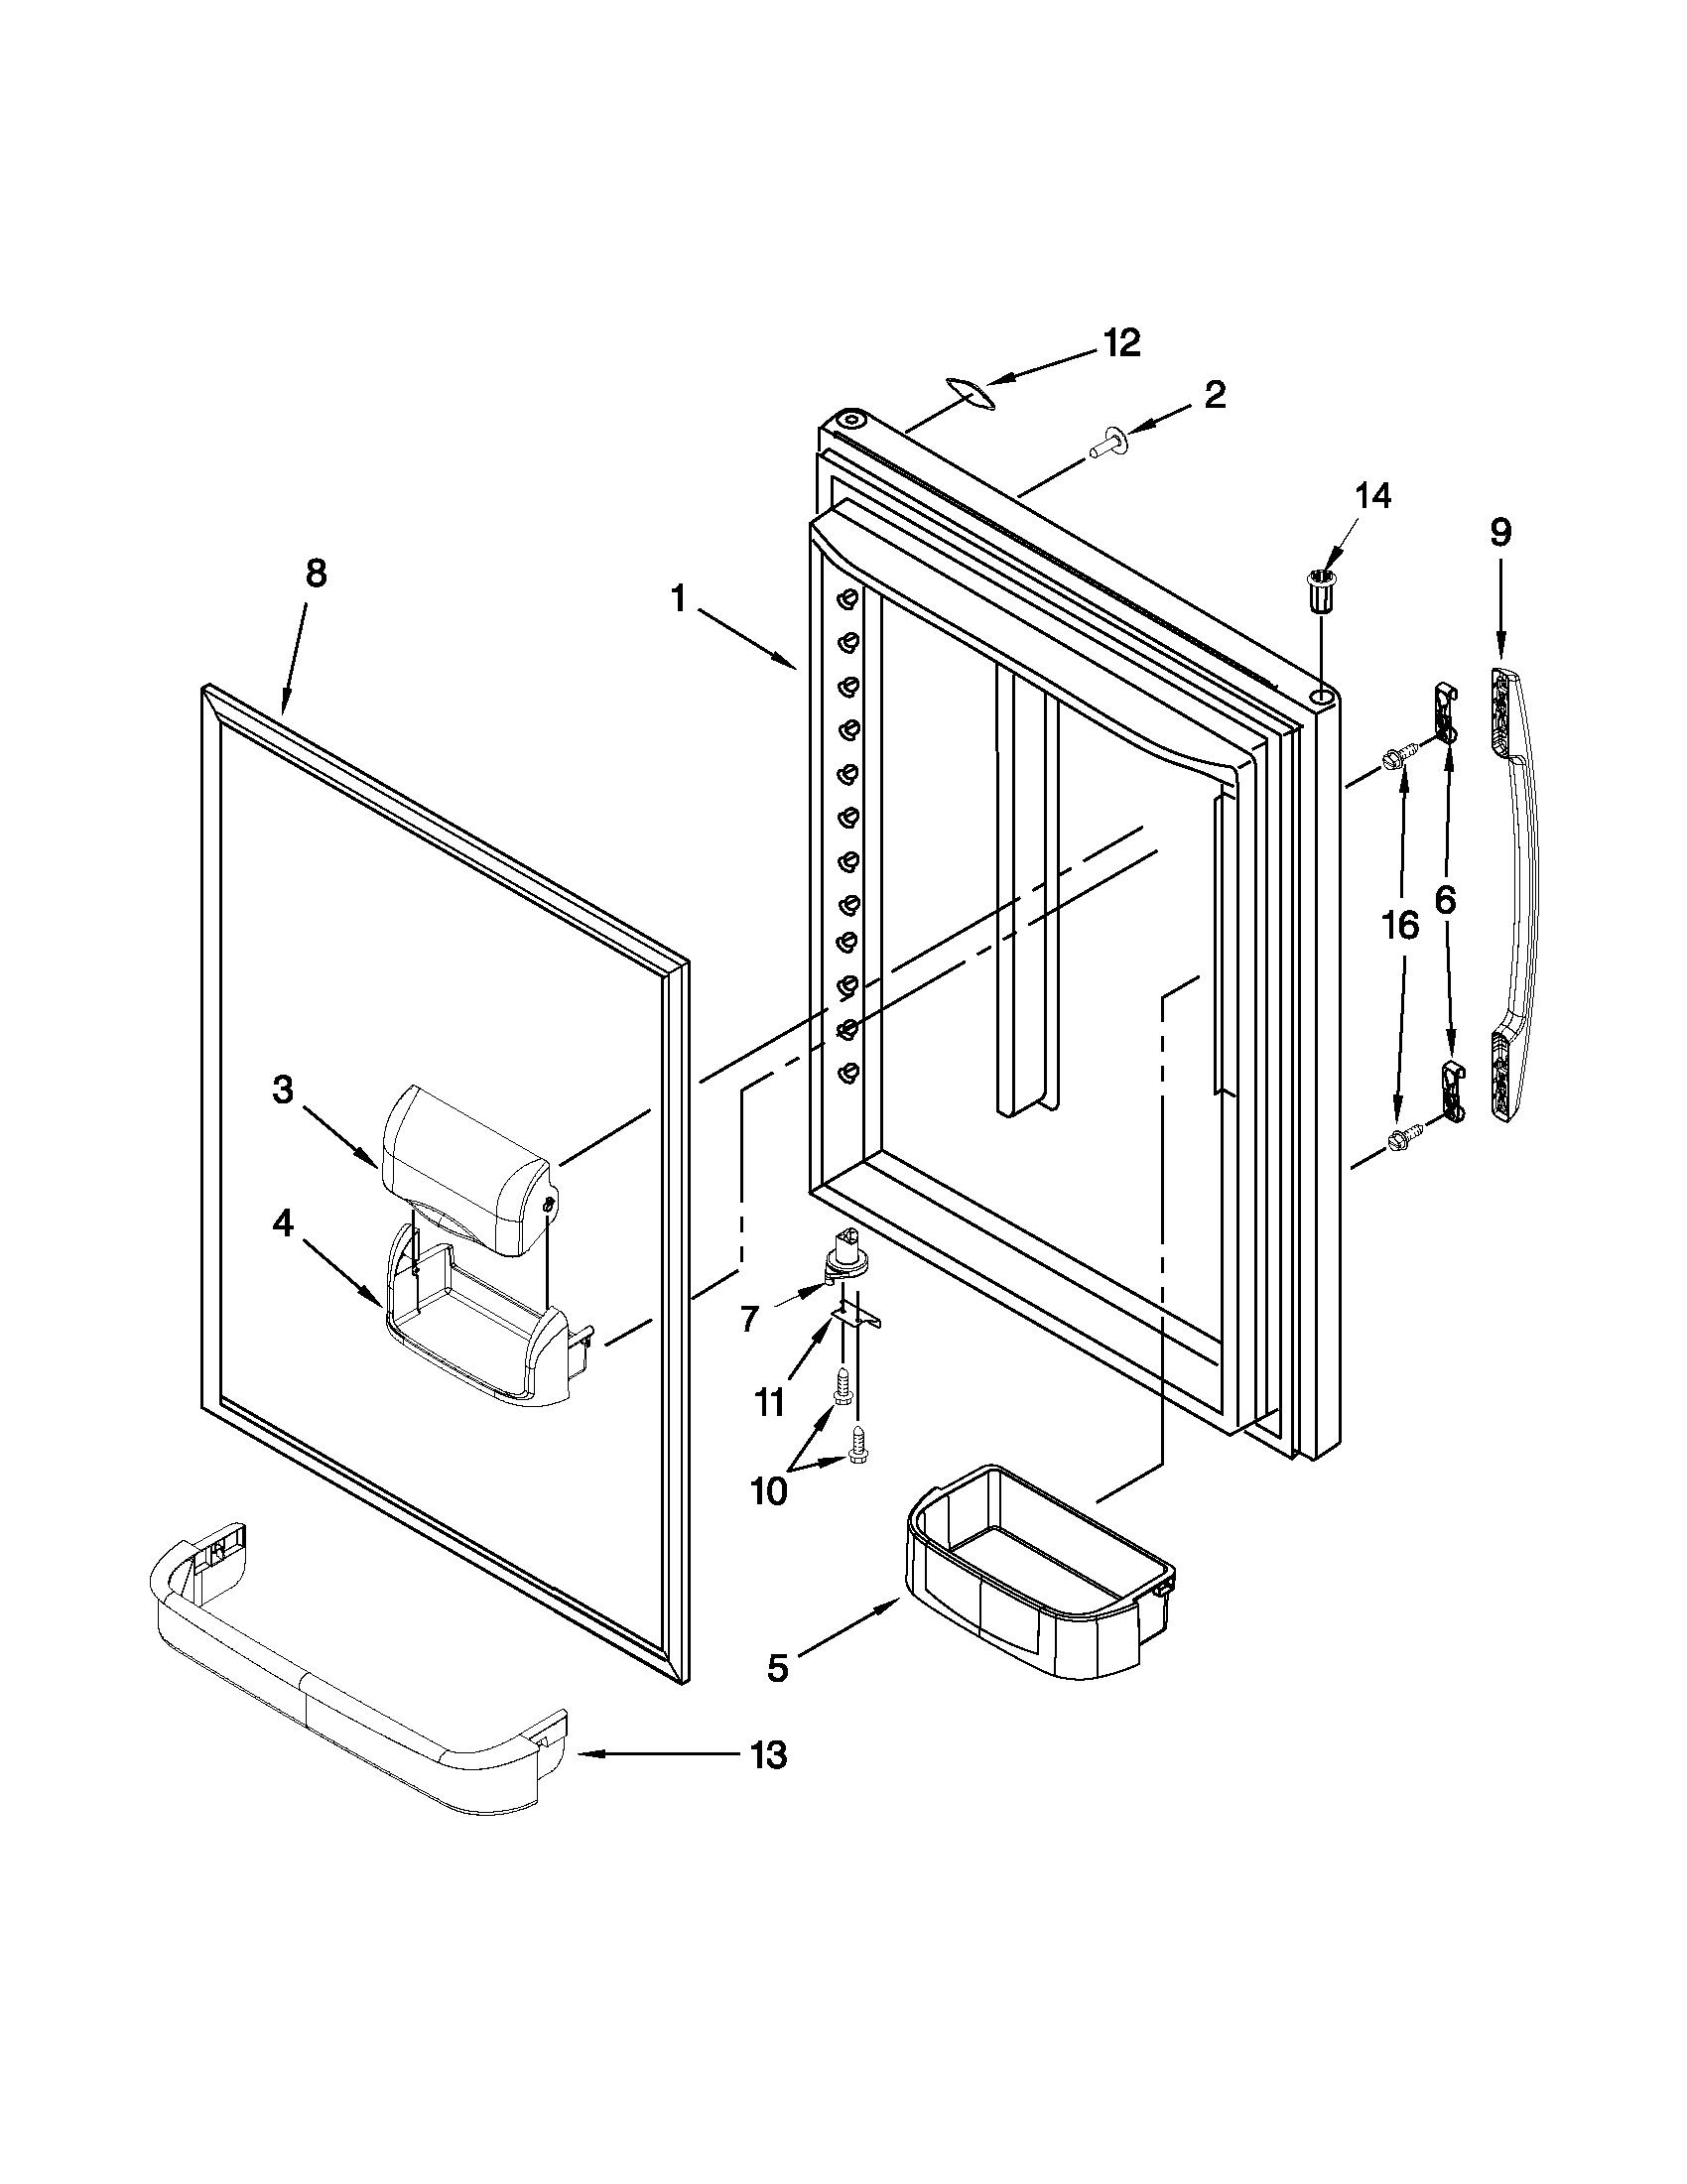 Maytag model MBF1958XES6 bottom-mount refrigerator genuine